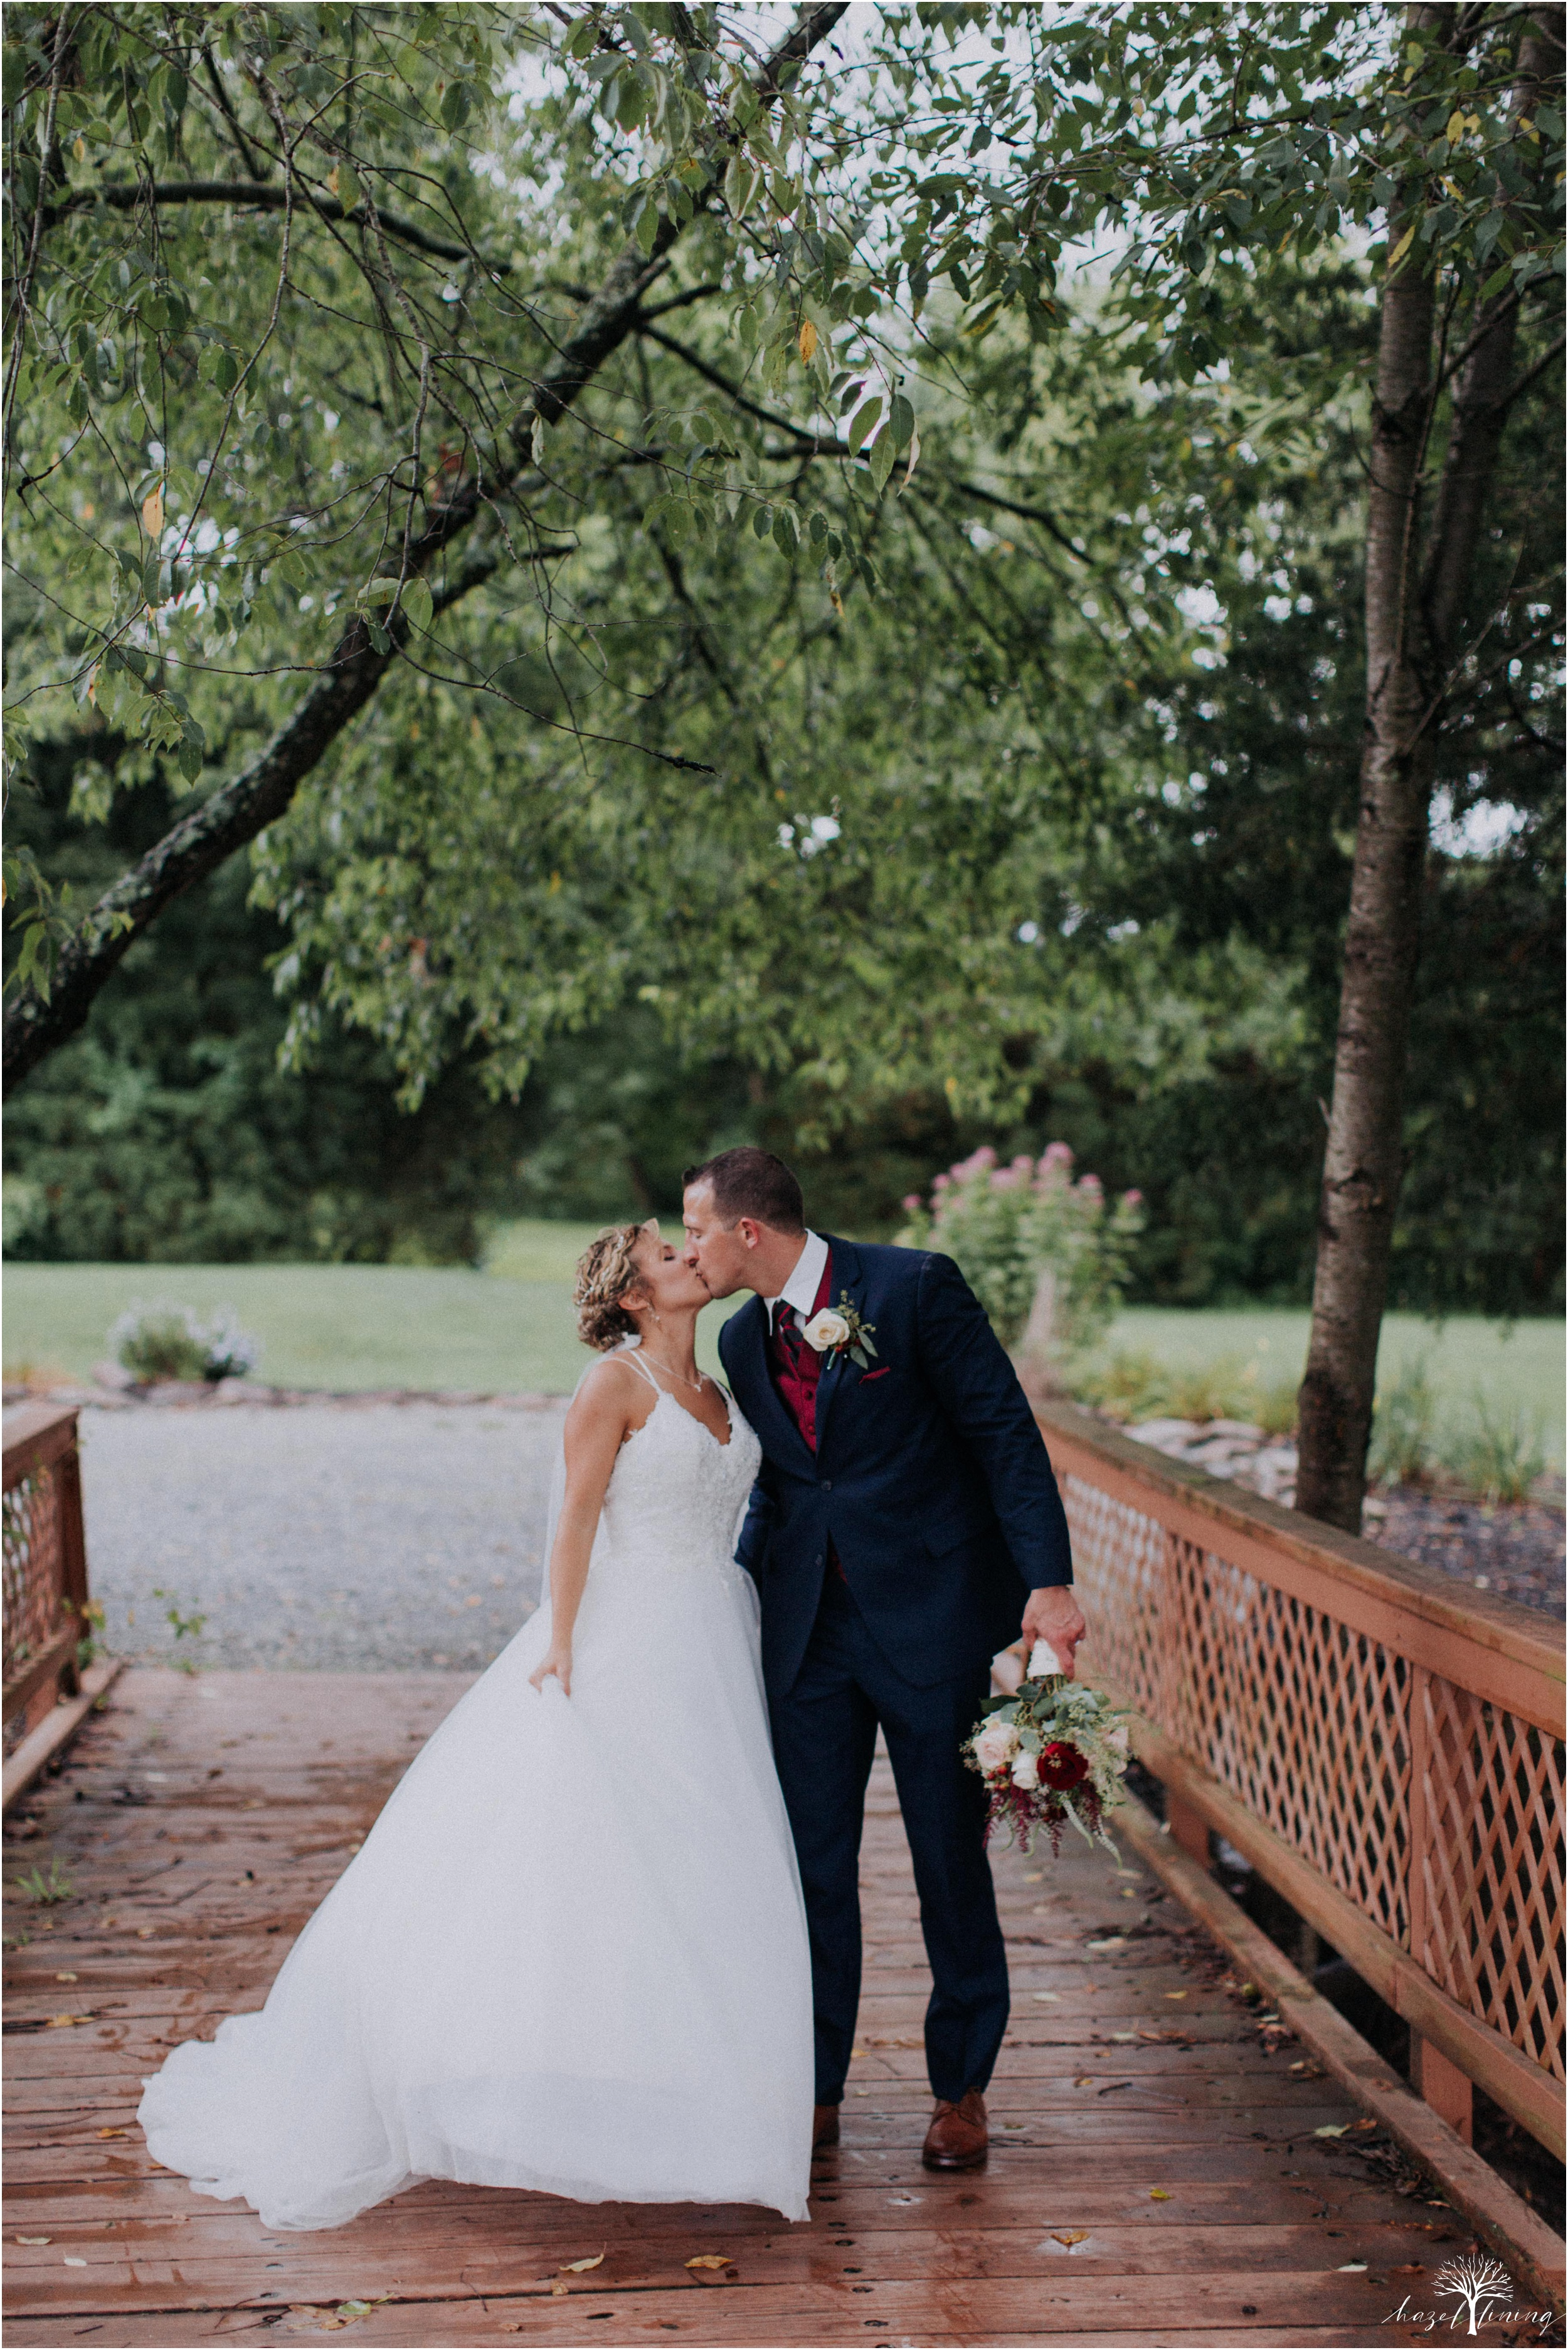 jonathan-weibel-becky-haywood-loft-at-sweetwater-cc-pennsburg-pennsylvania-rainy-day-summer-wedding-hazel-lining-travel-wedding-elopement-photography_0103.jpg